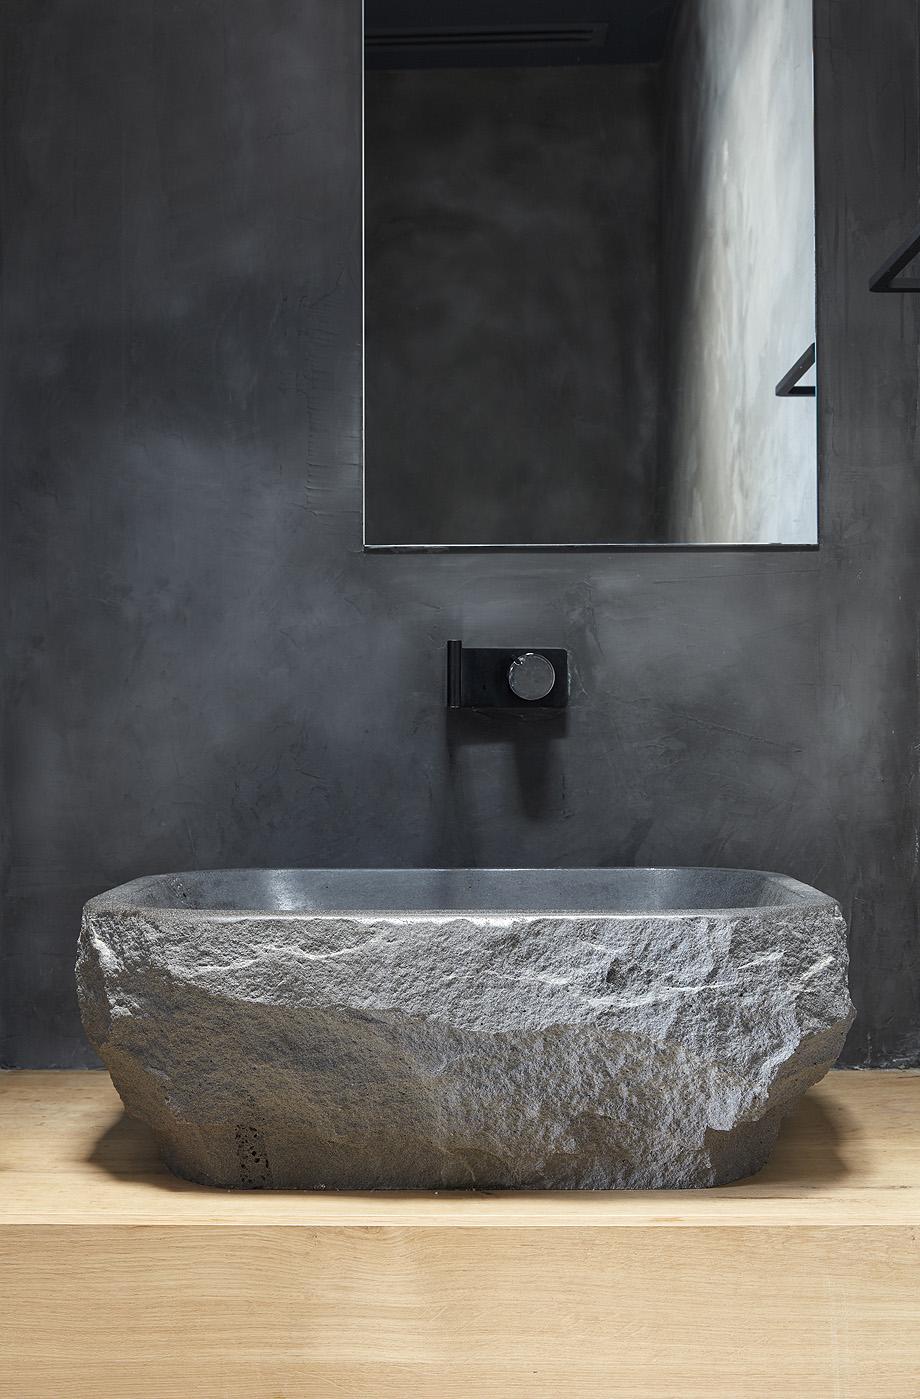 quarry house de finnis architects - foto tom roe (16)